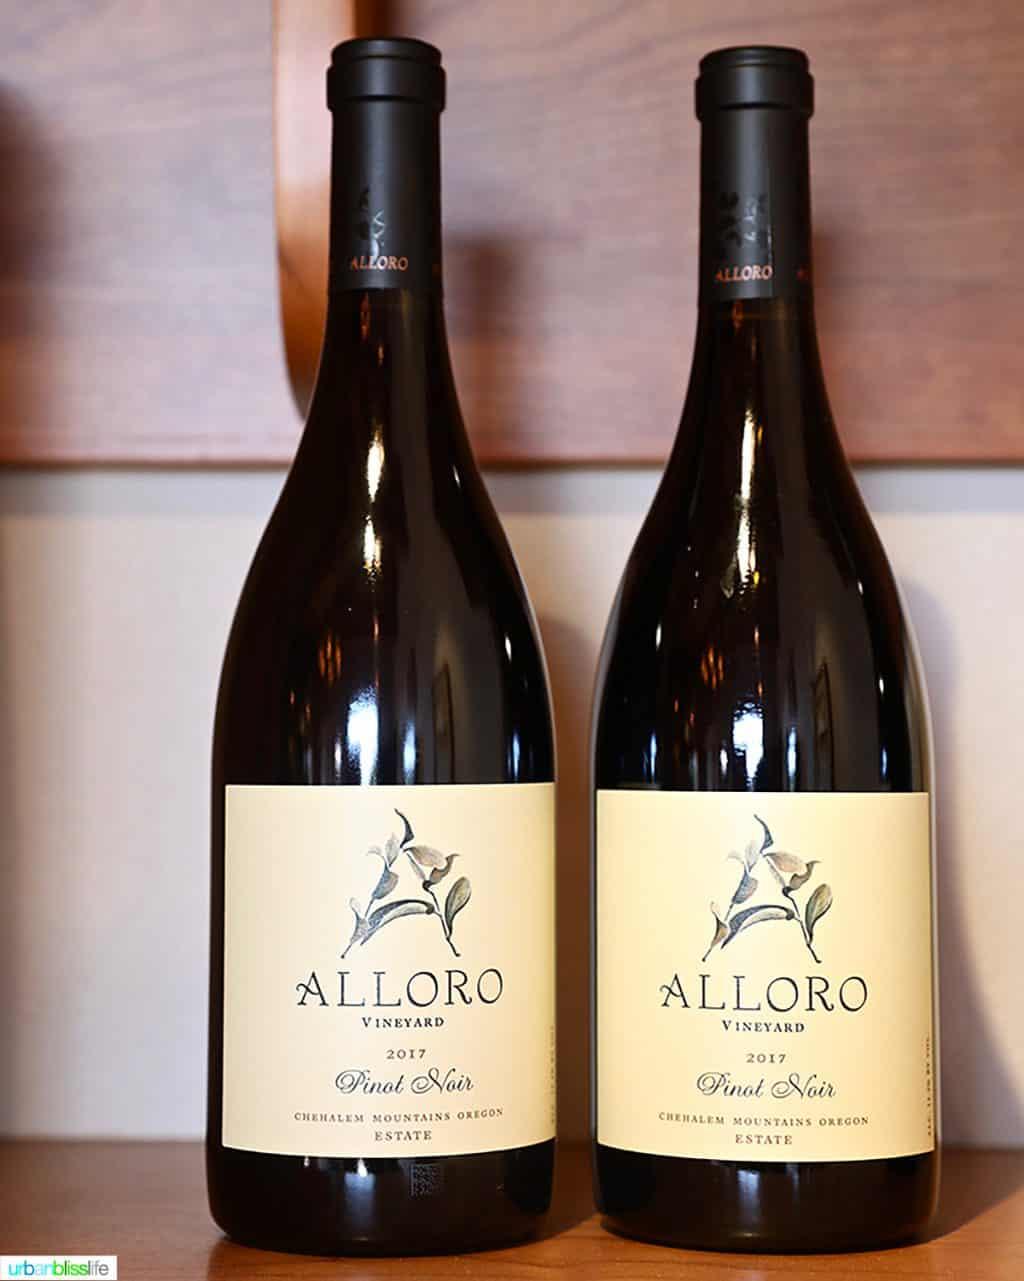 two bottles of Alloro Vineyard Pinot Noir